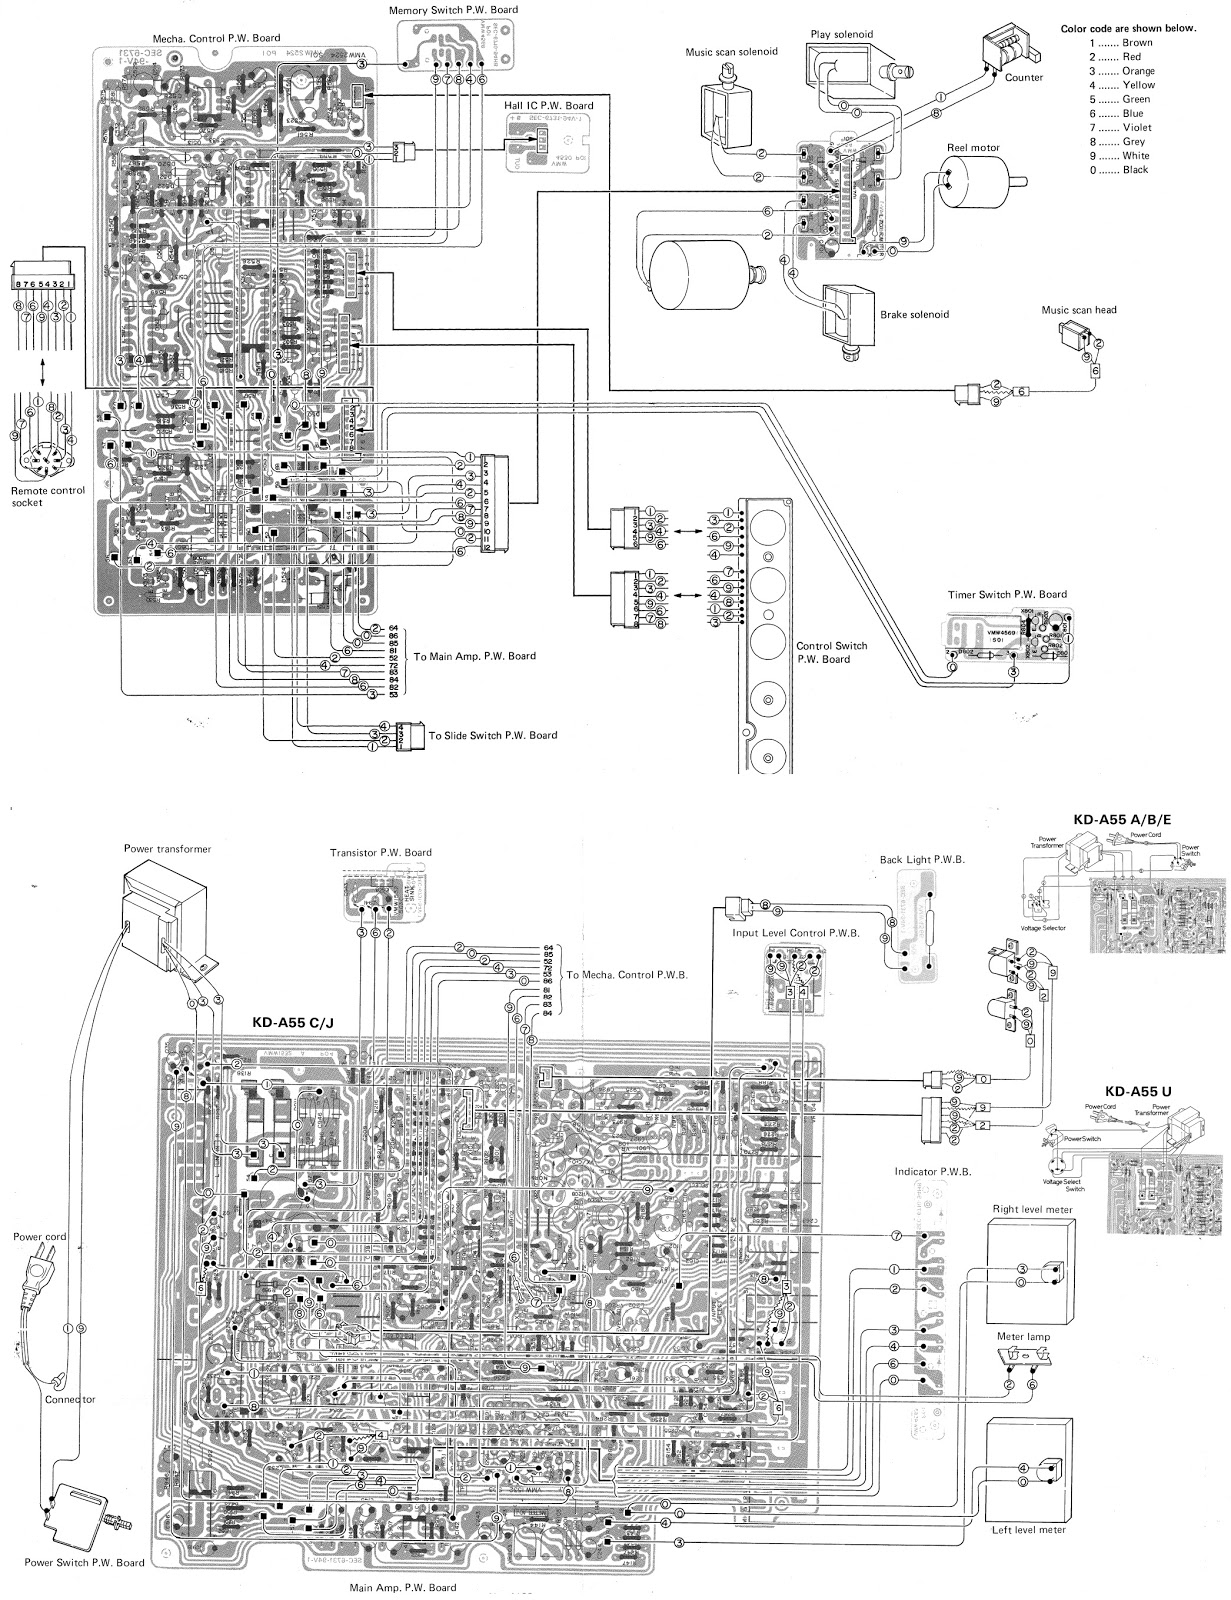 small resolution of alpine ina w900 wiring diagram wiring diagram todays rh 3 18 10 1813weddingbarn com alpine ina